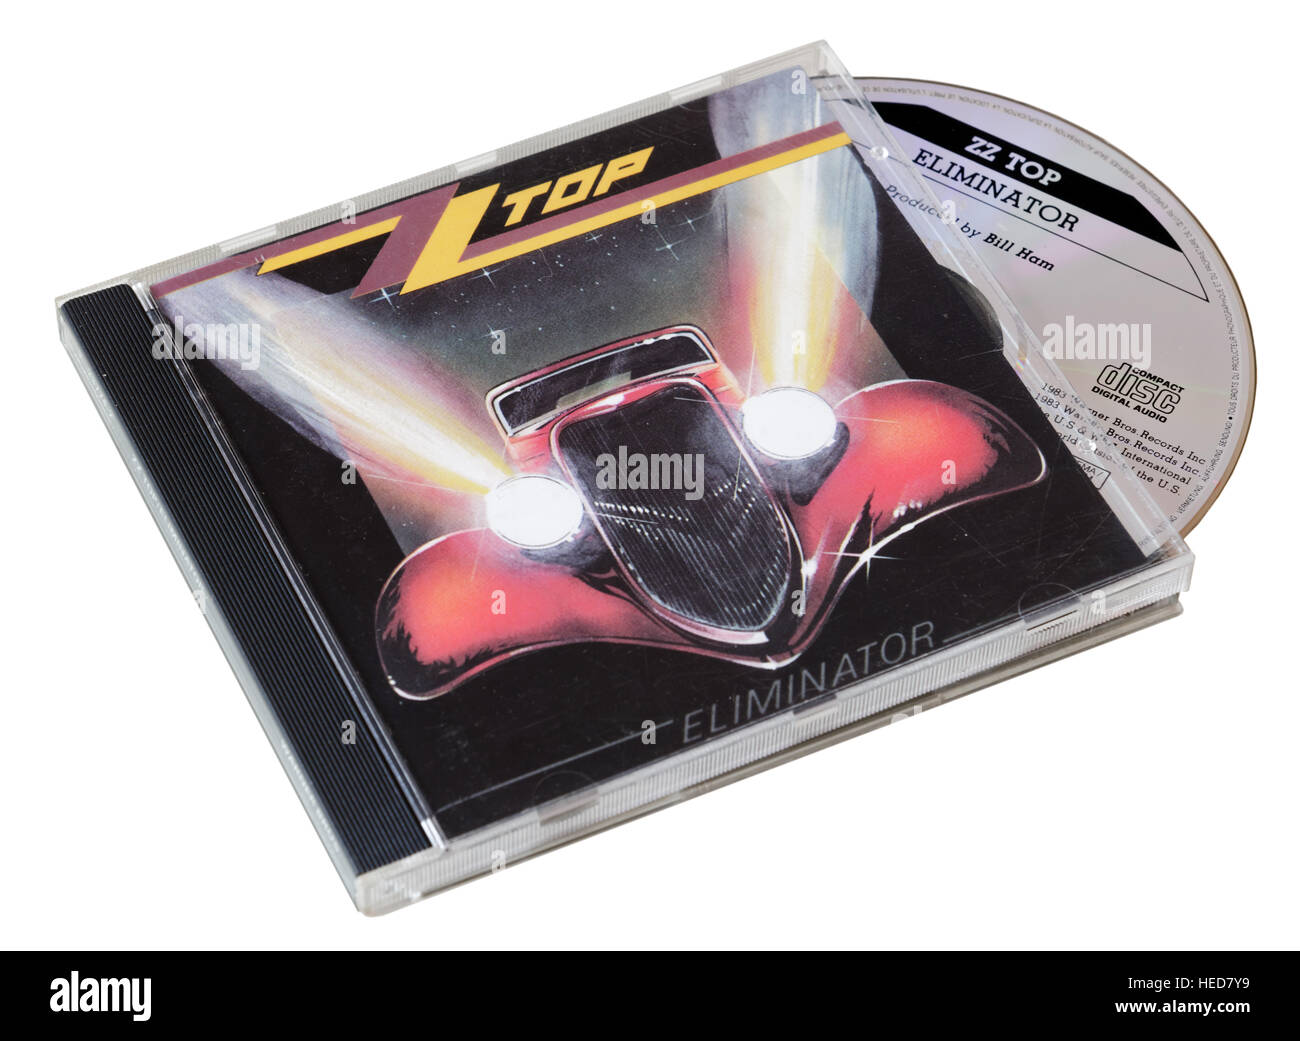 ZZ Top Eliminator CD - Stock Image